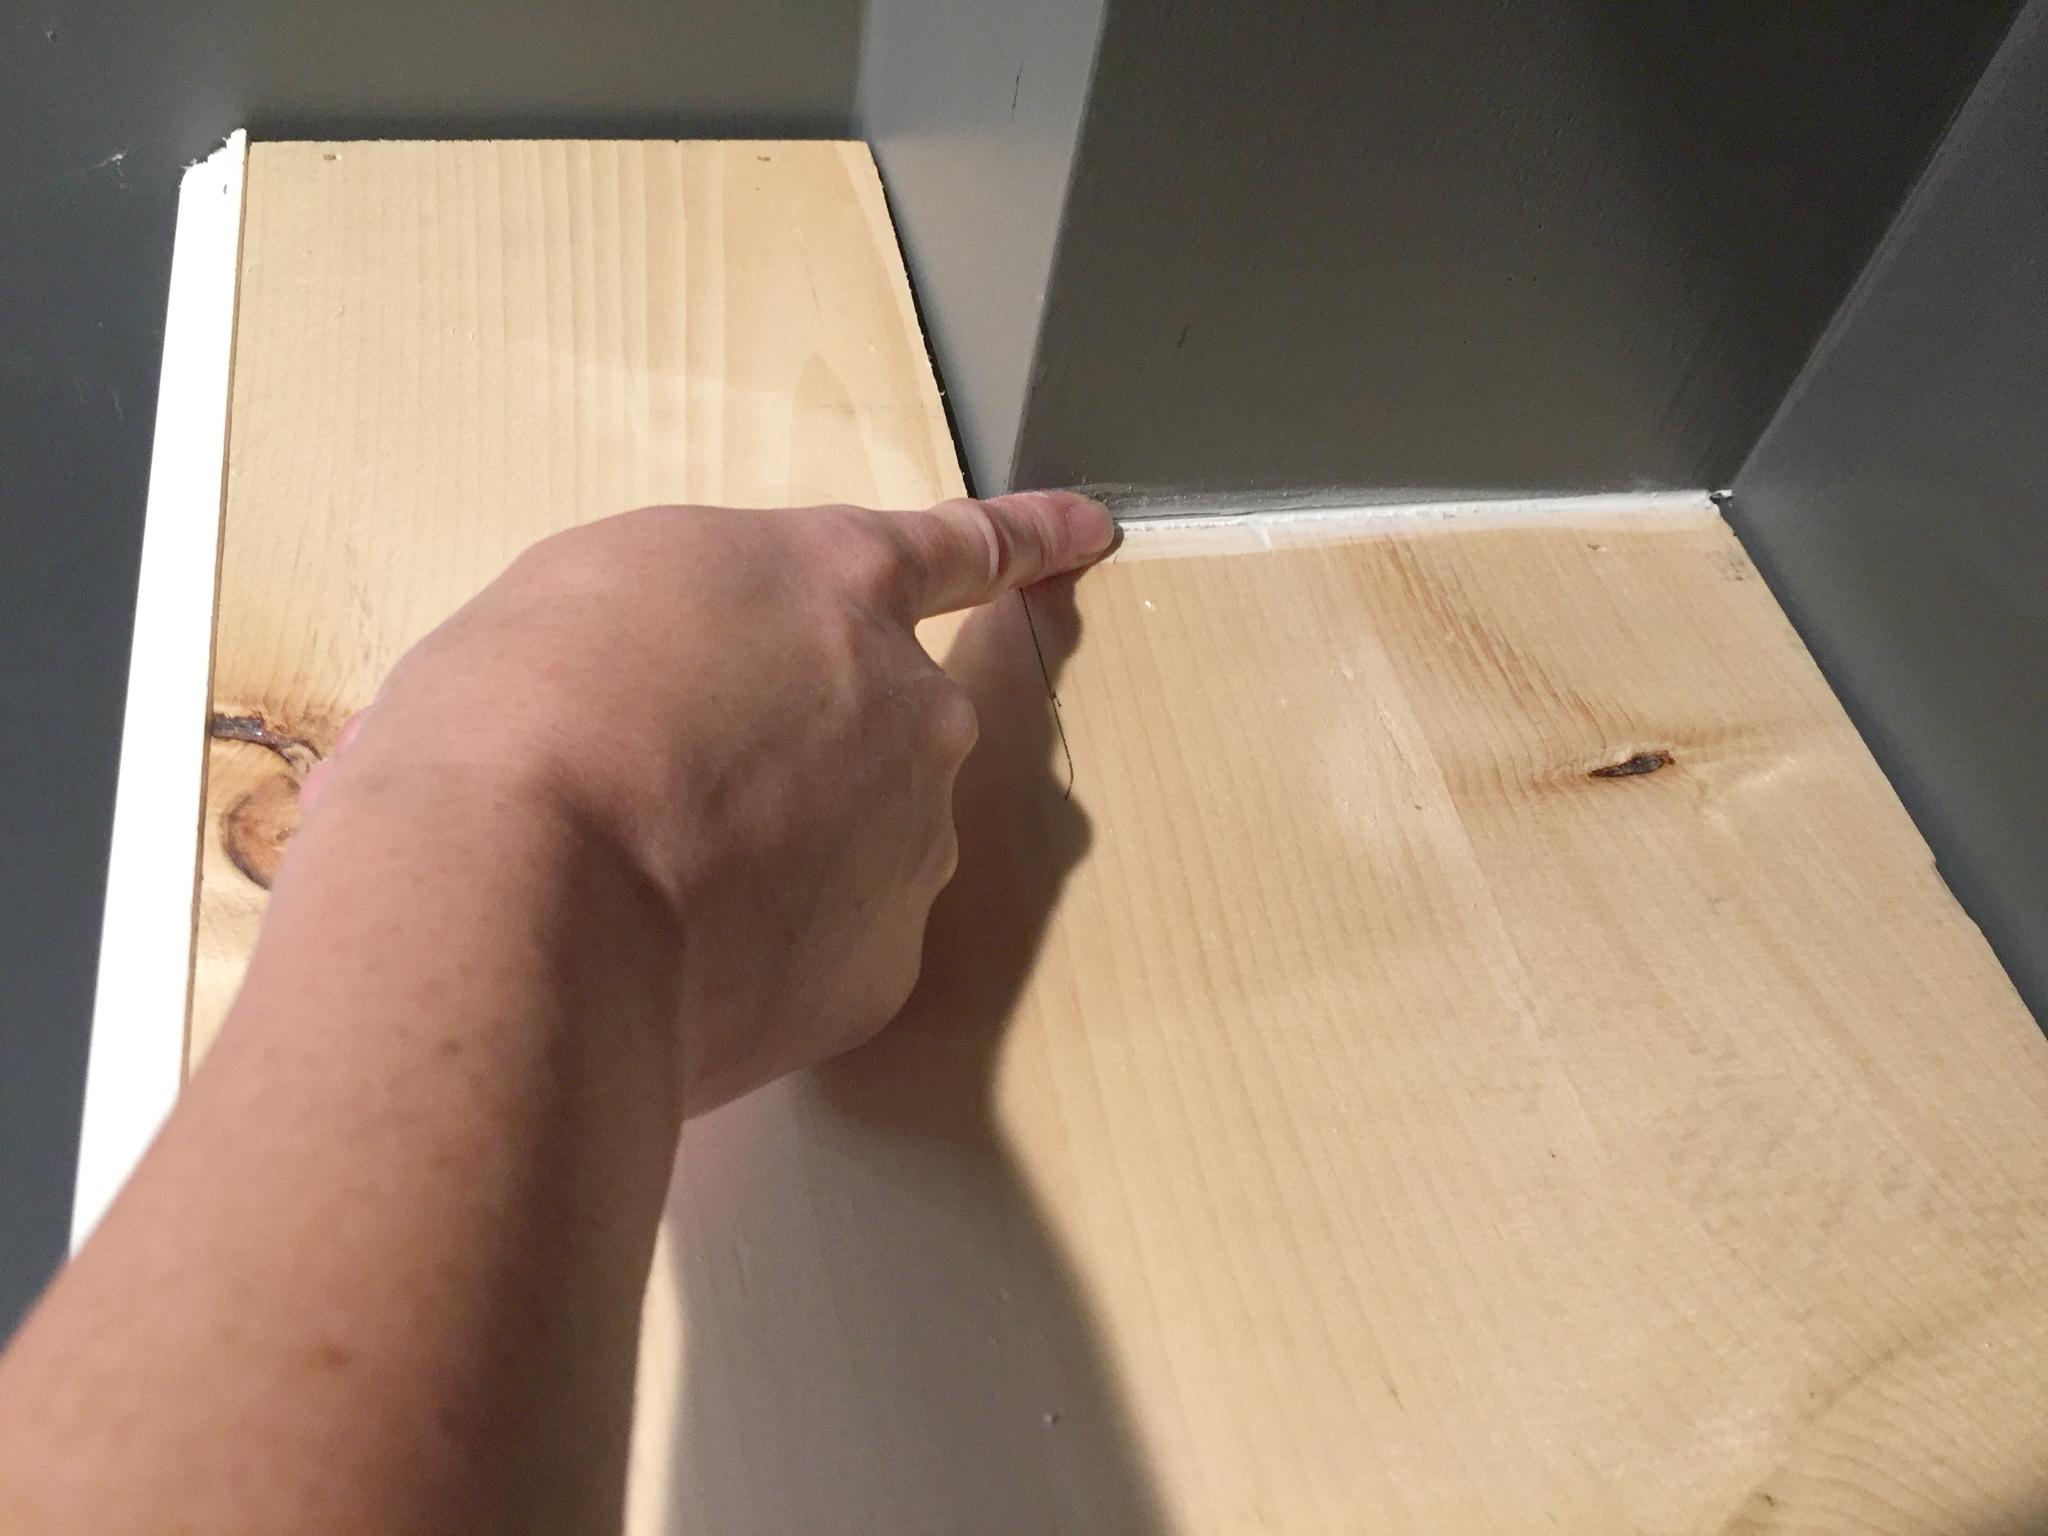 How to Paint Trim and Doors: Caulk any gaps.